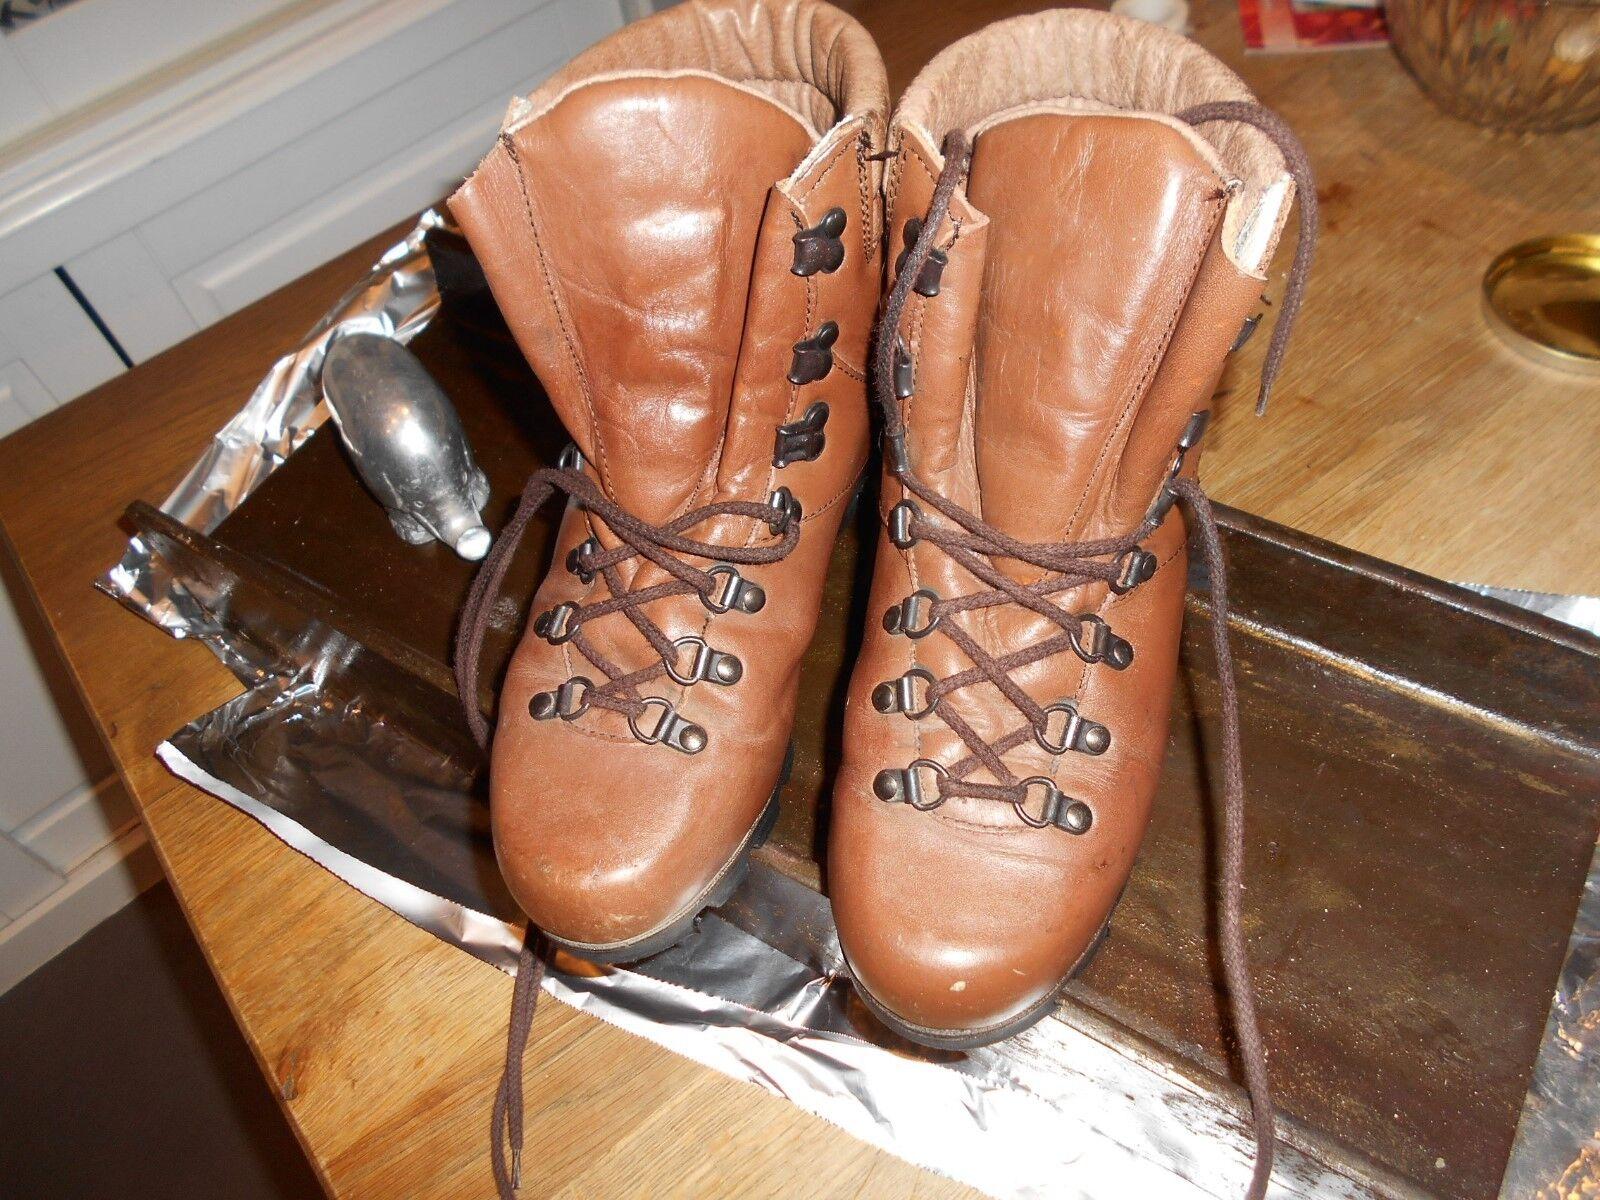 Rare en marchant chaussures varappe ISBA marron t 38 tbe has  ach imm fp rouge mond